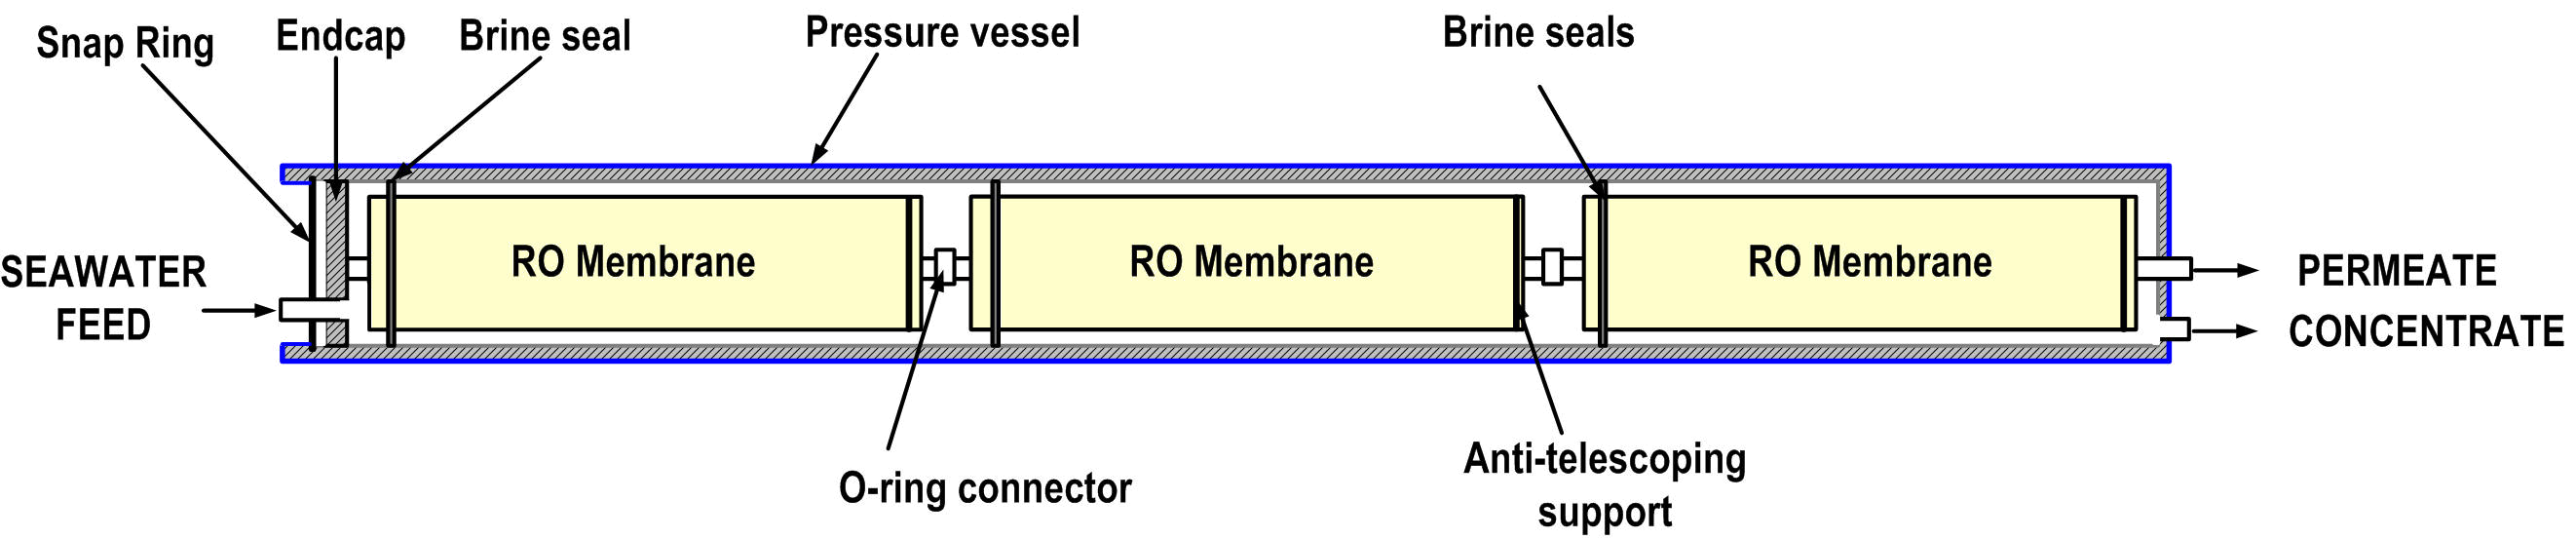 Reverse Osmosis Desalination Process Flow Diagram Labelling